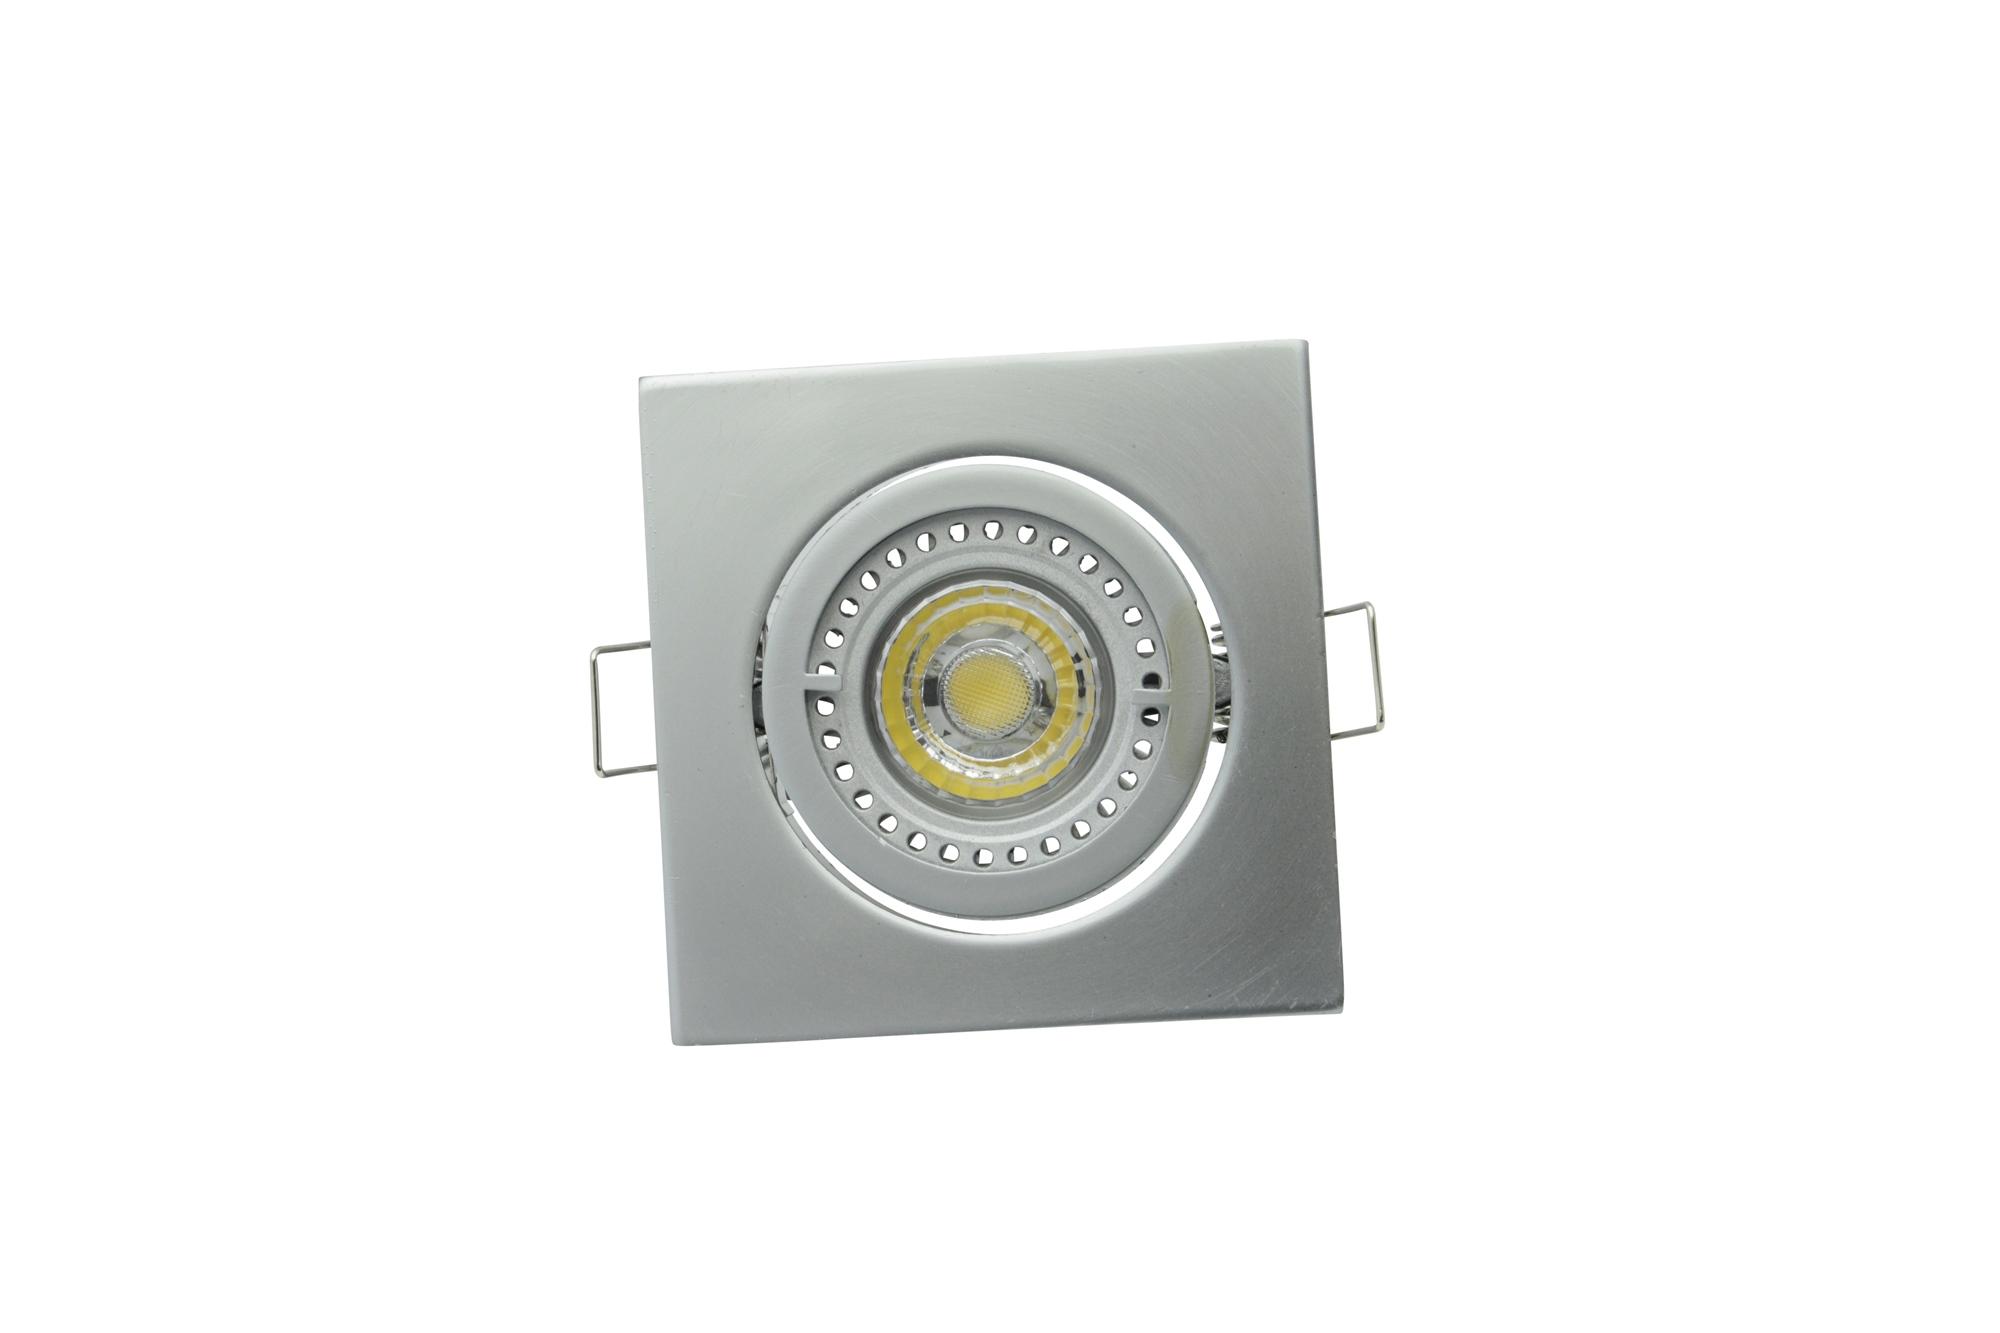 Lampenlux Einbaustrahler Spot Snap eckig Chrom matt schwenkbar 8.2x8.2cm 12V rostfrei